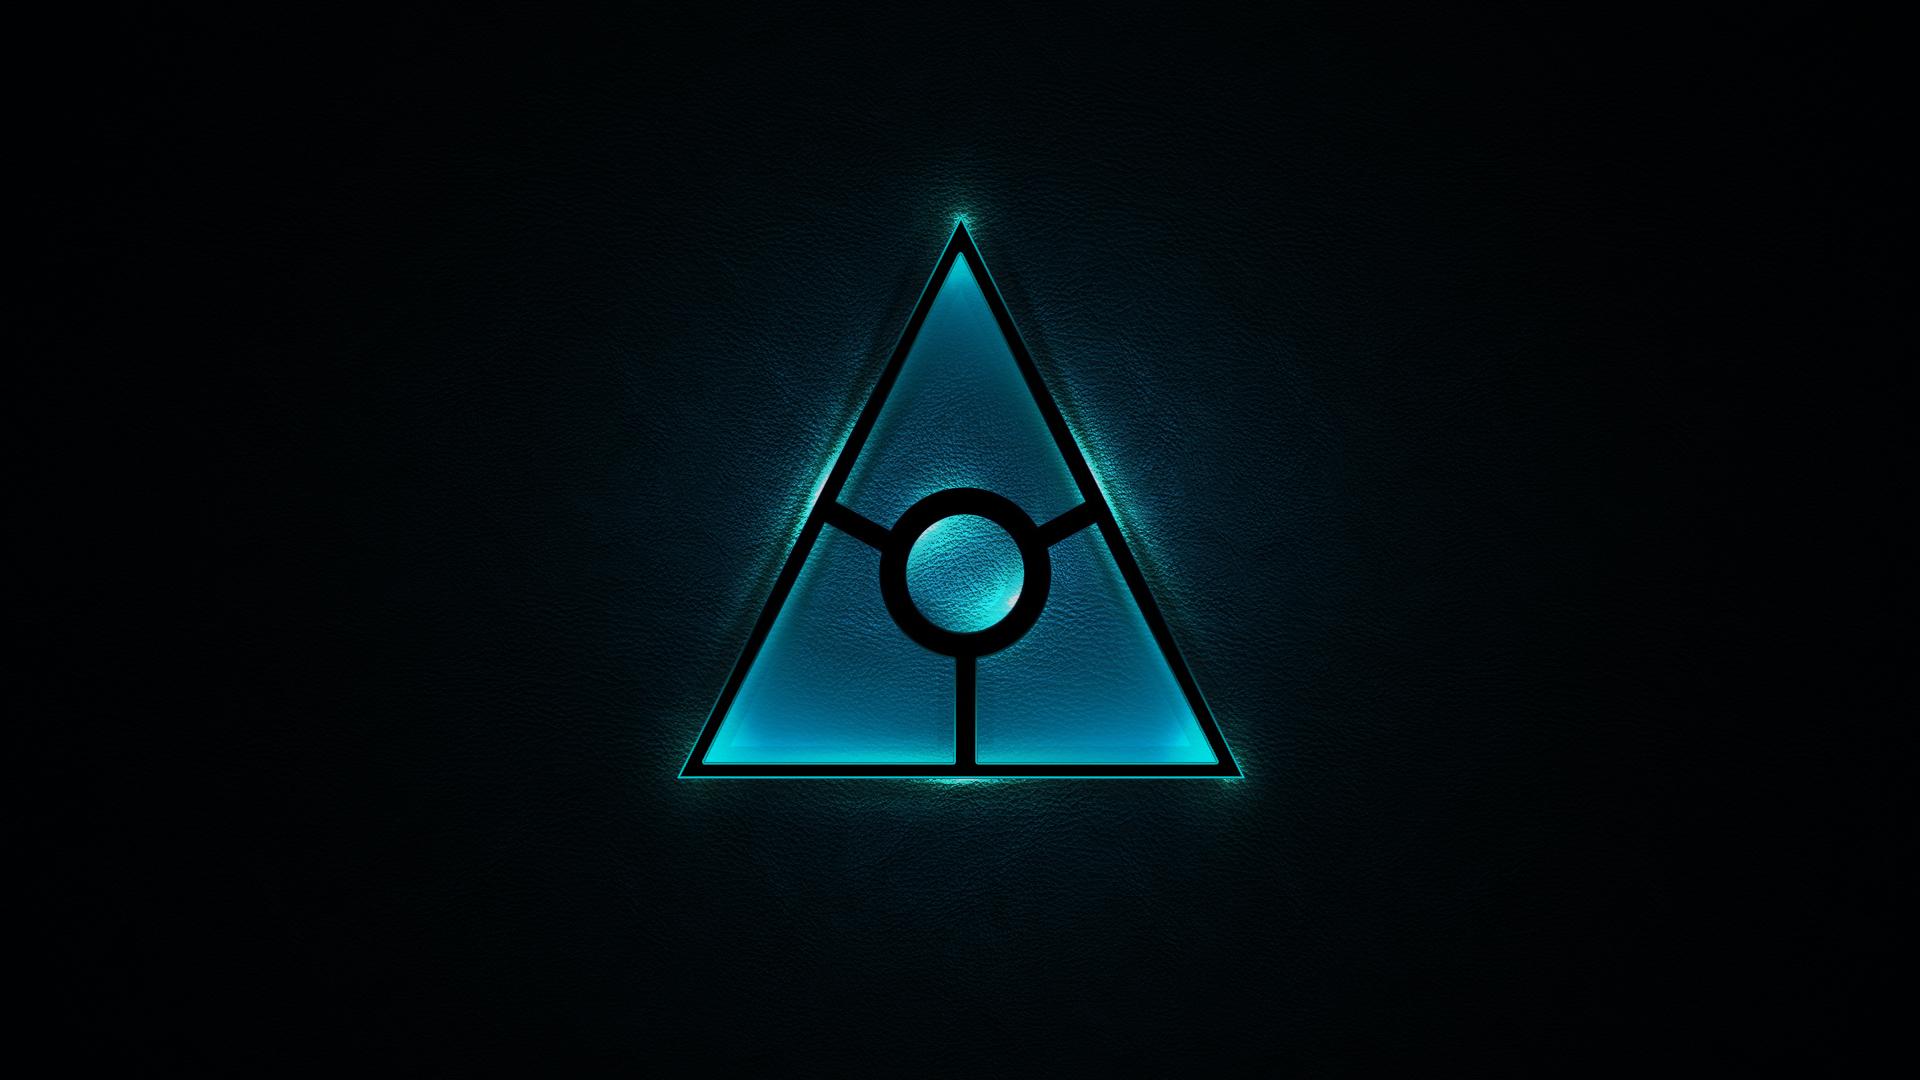 illuminati logos and symbols - photo #19